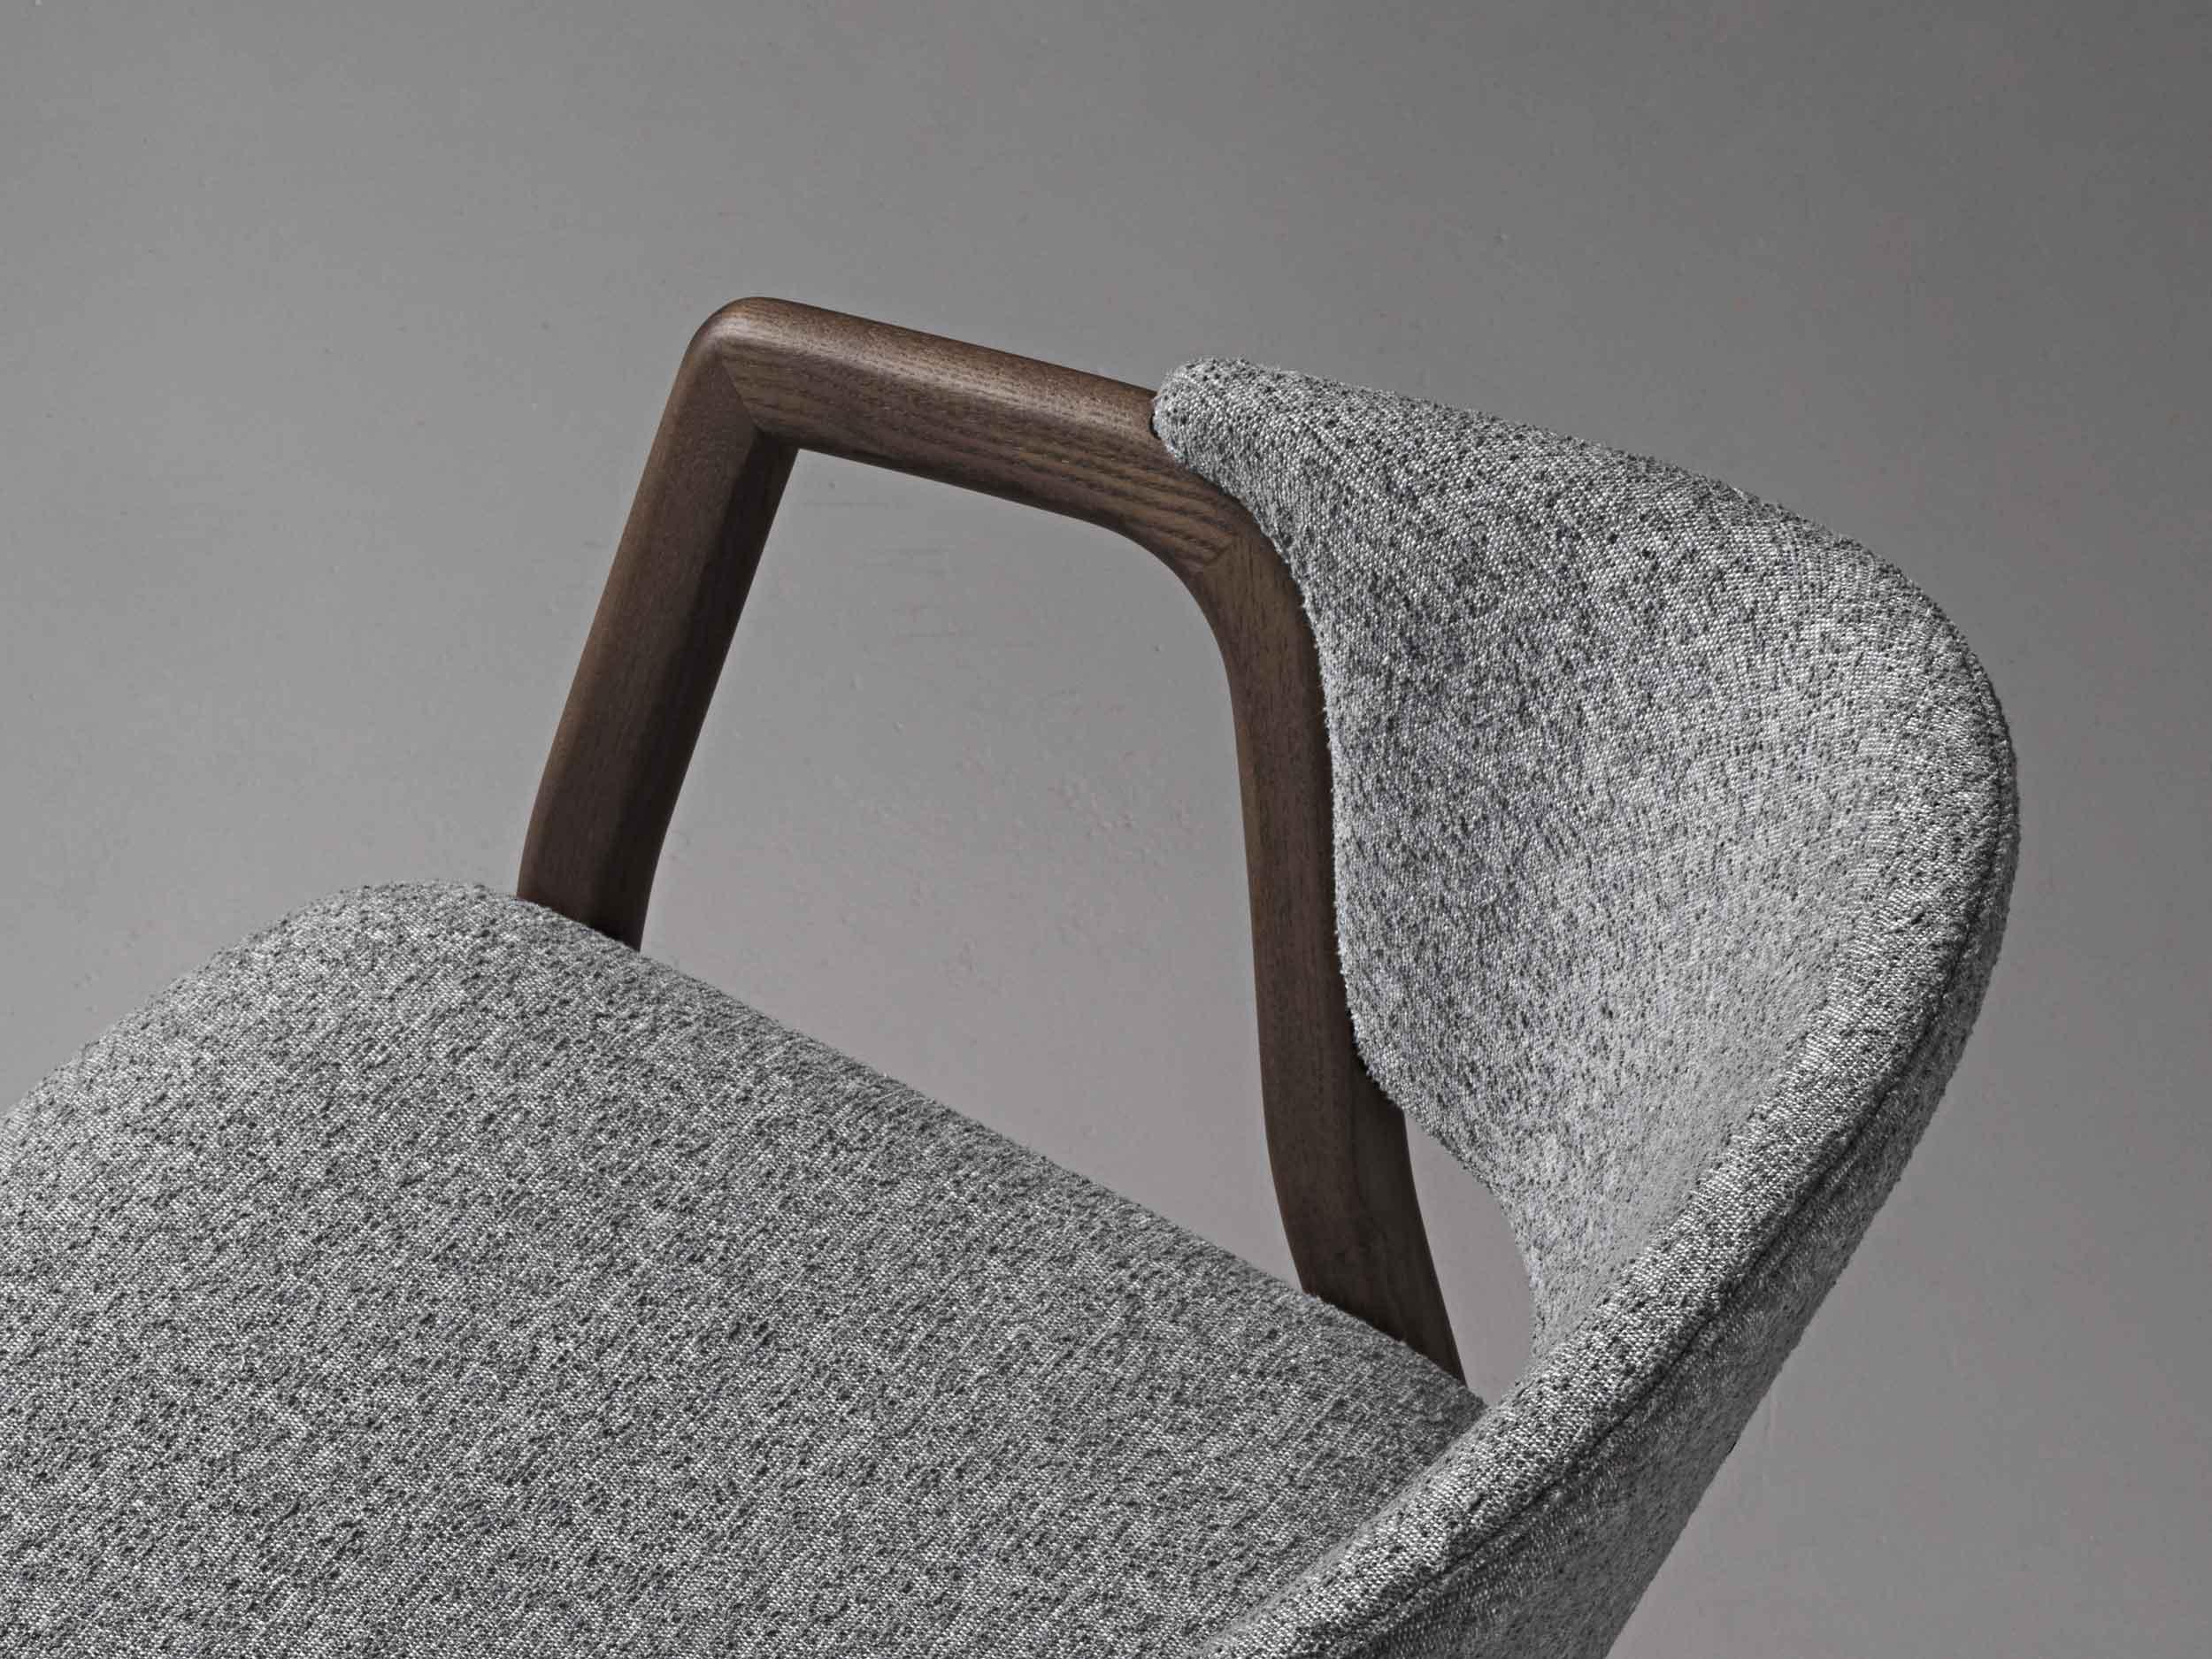 VERY_WOOD_CAMDEN_armchair_studio_06_detail_web_.jpg